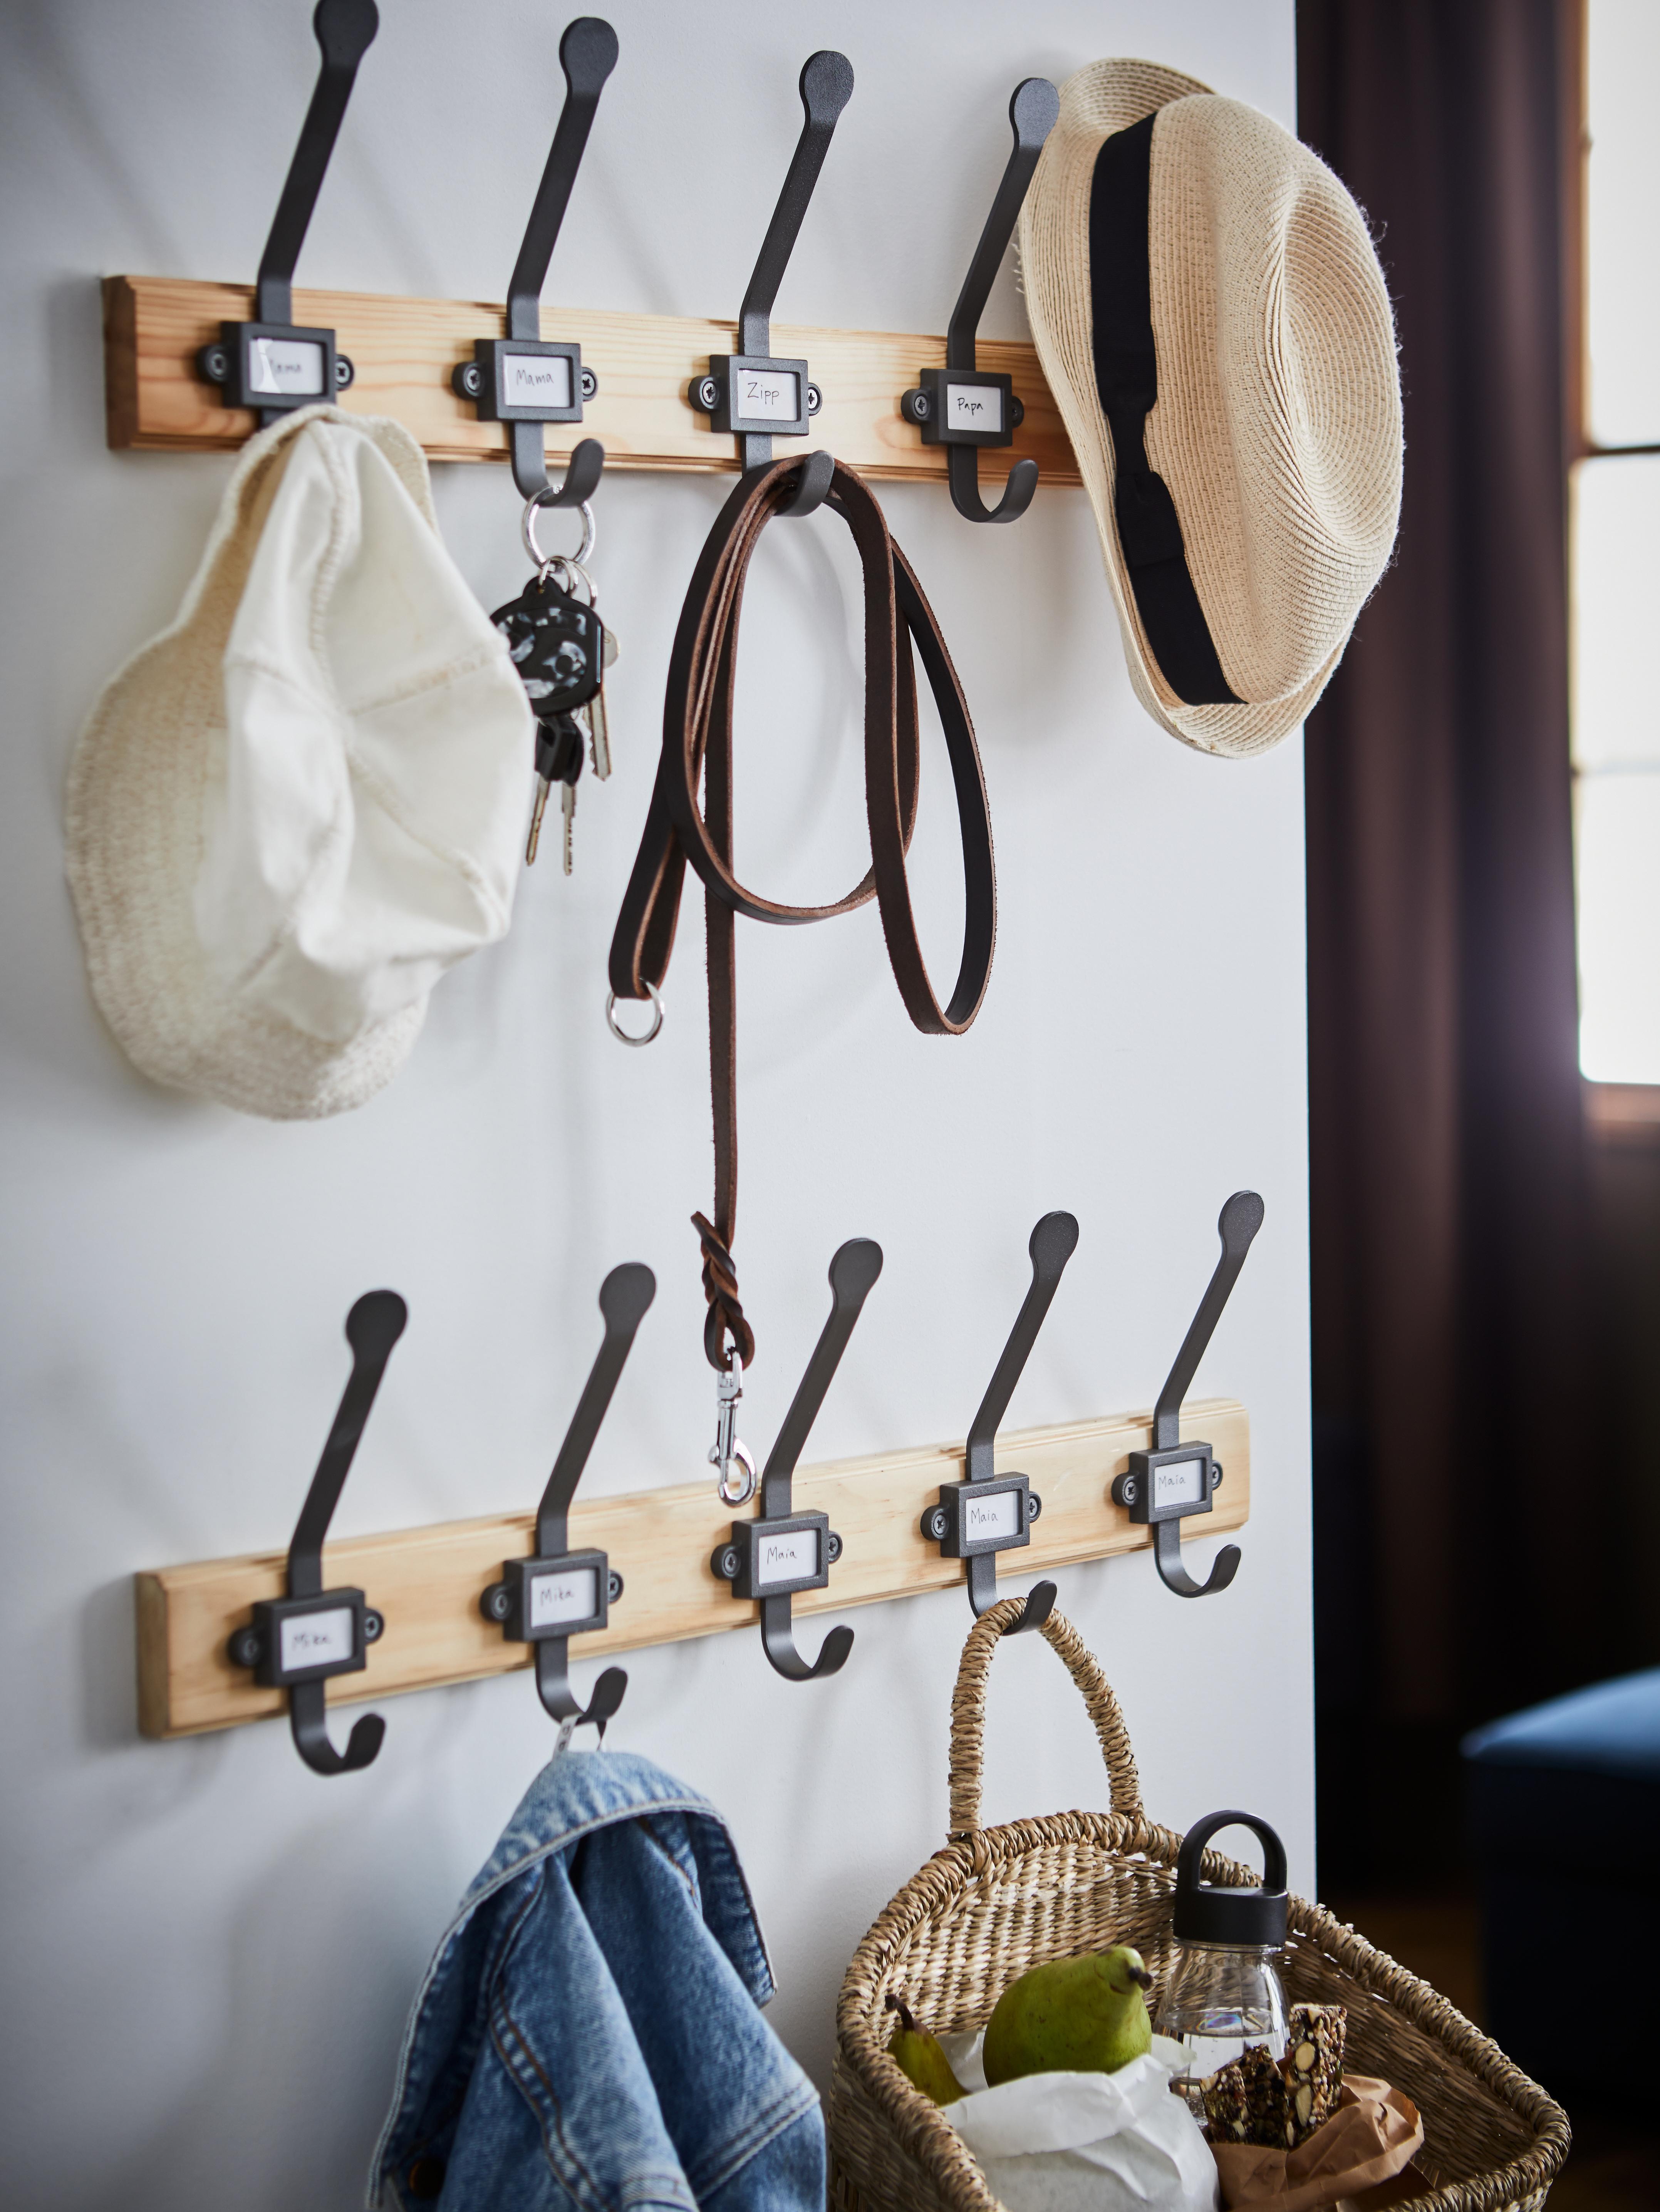 A jacket, a picnic basket, two hats, keys and a dog leash hanging on two pine/grey KARTOTEK racks with 5 hooks in a hallway.